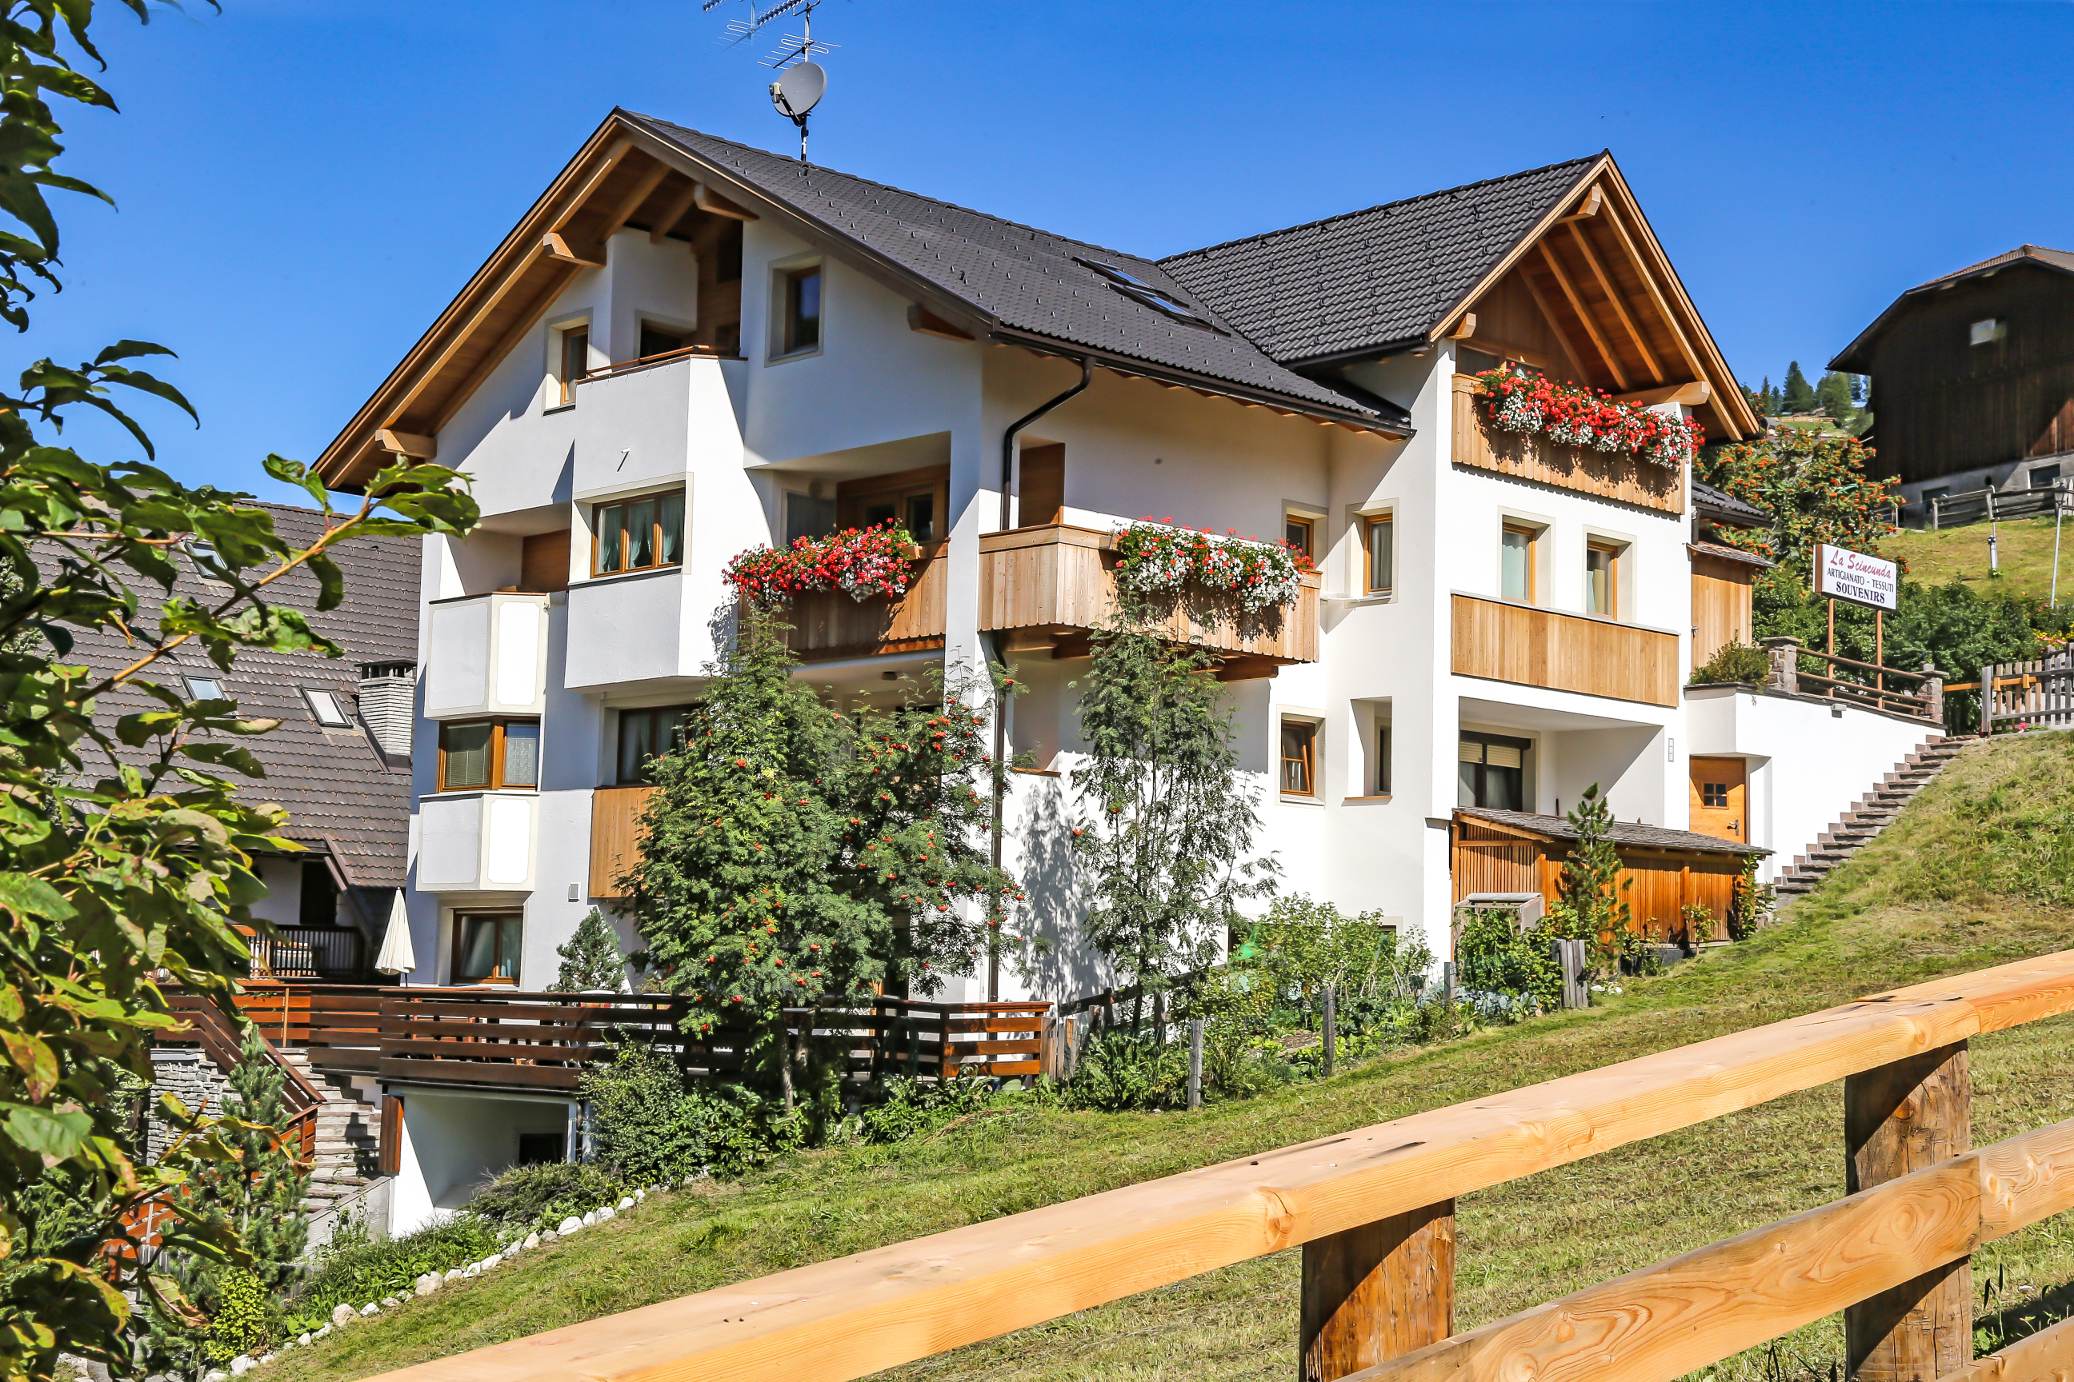 Trentino Alto Adige Artigianato apartment for 4 people, ciasa sandra - apartments for rent